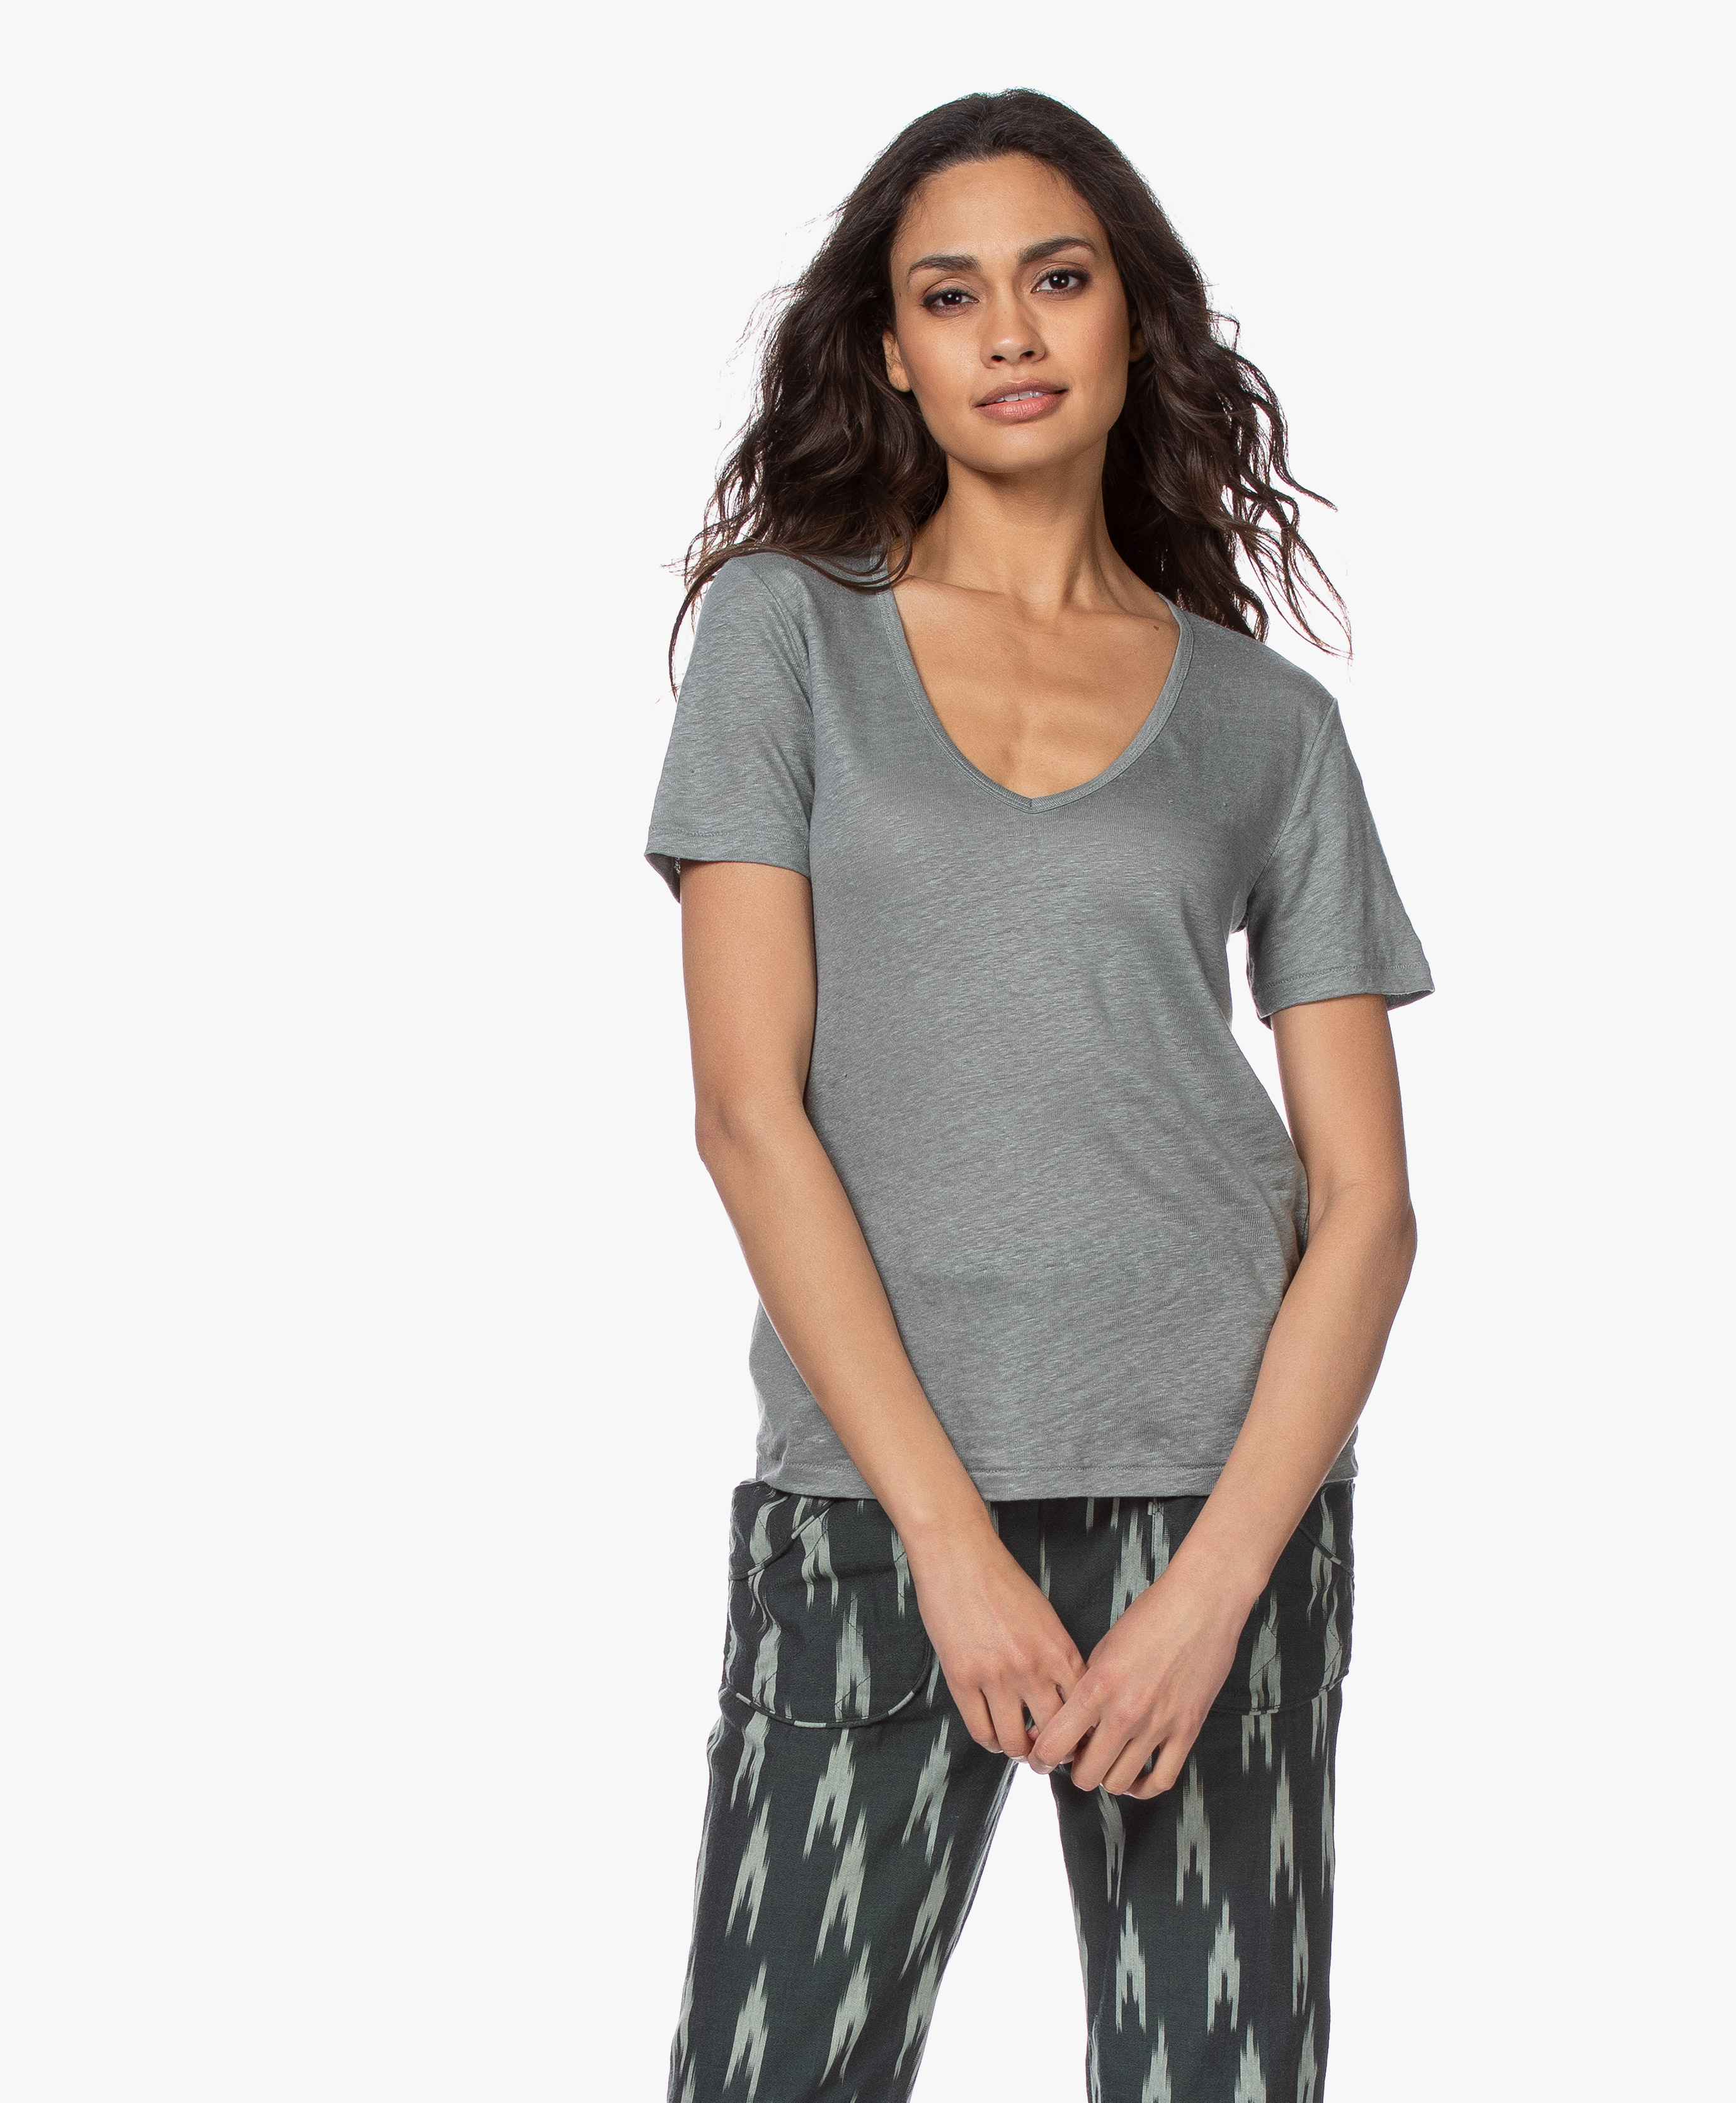 Closed Linen V neck T shirt Dusty Pine c95858 444 22 691